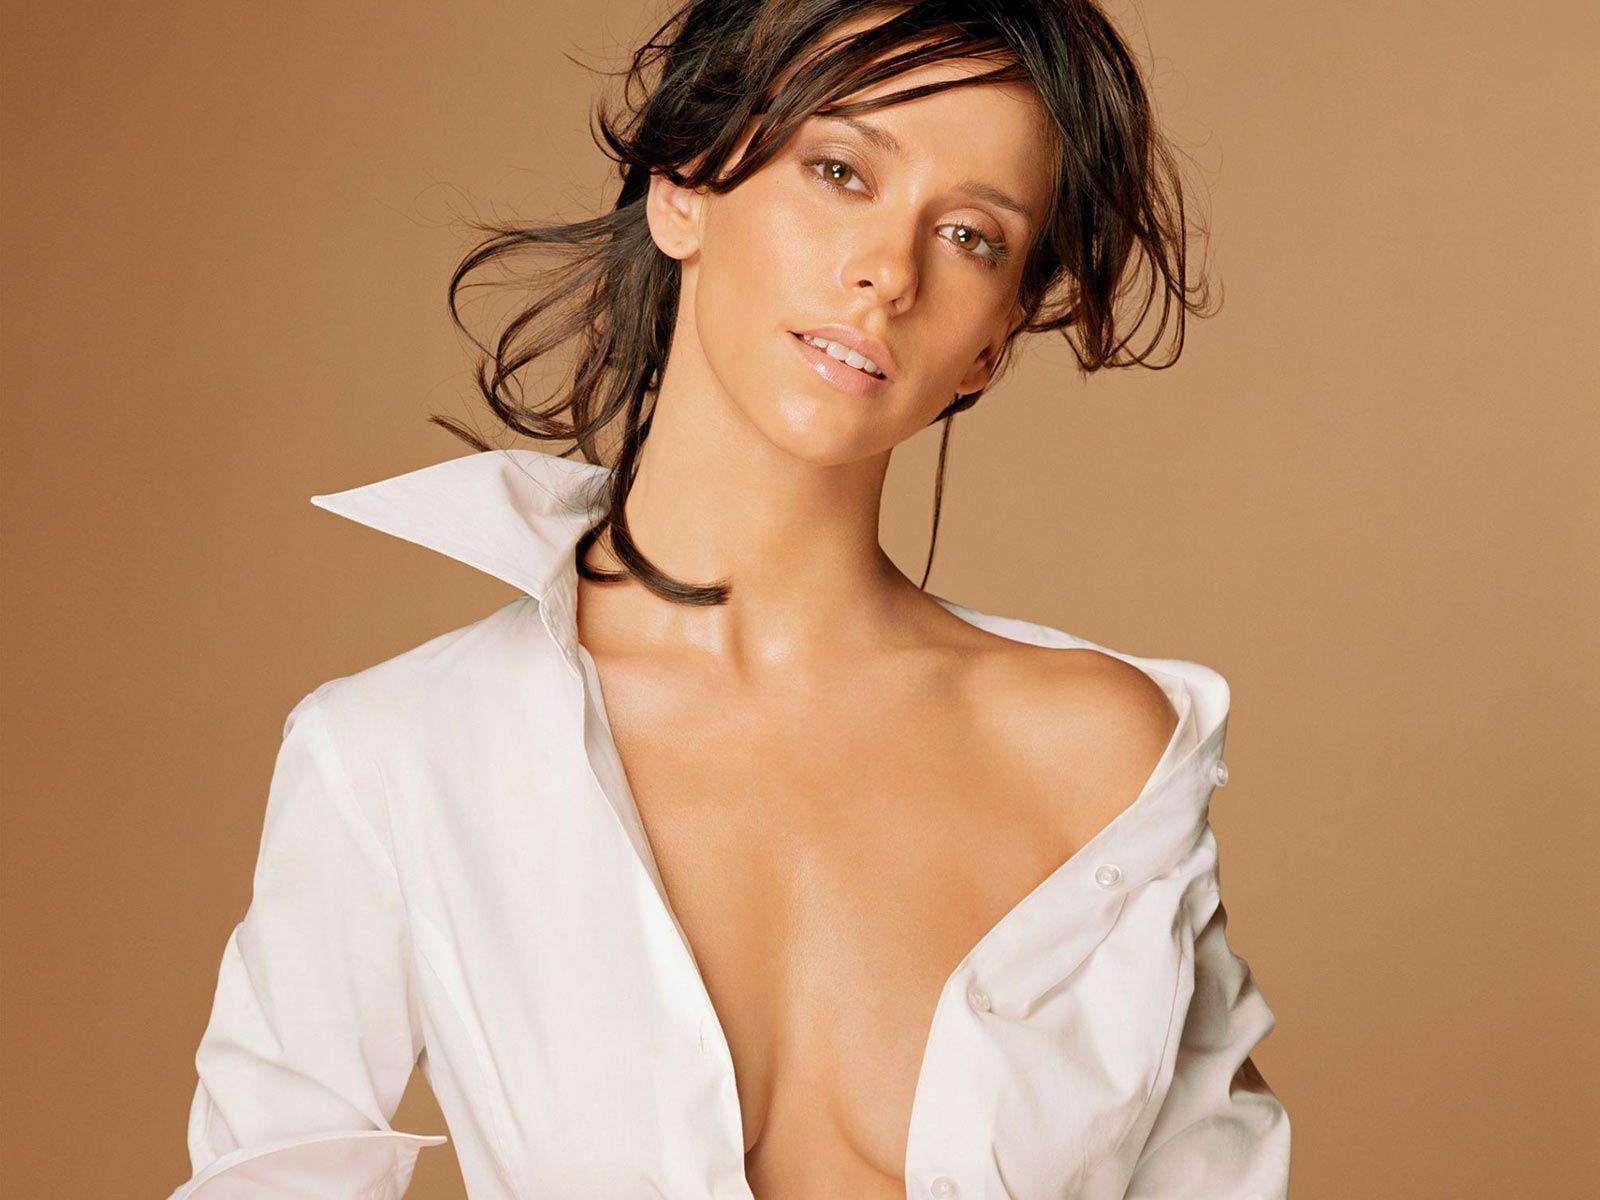 http://3.bp.blogspot.com/-yDsVjAi0qNI/TbwK1czP6CI/AAAAAAAAOgA/dM2FMEoBjwE/s1600/Jennifer_Love_Hewitt_hd_wallpaper%2B%25281%2529.jpg